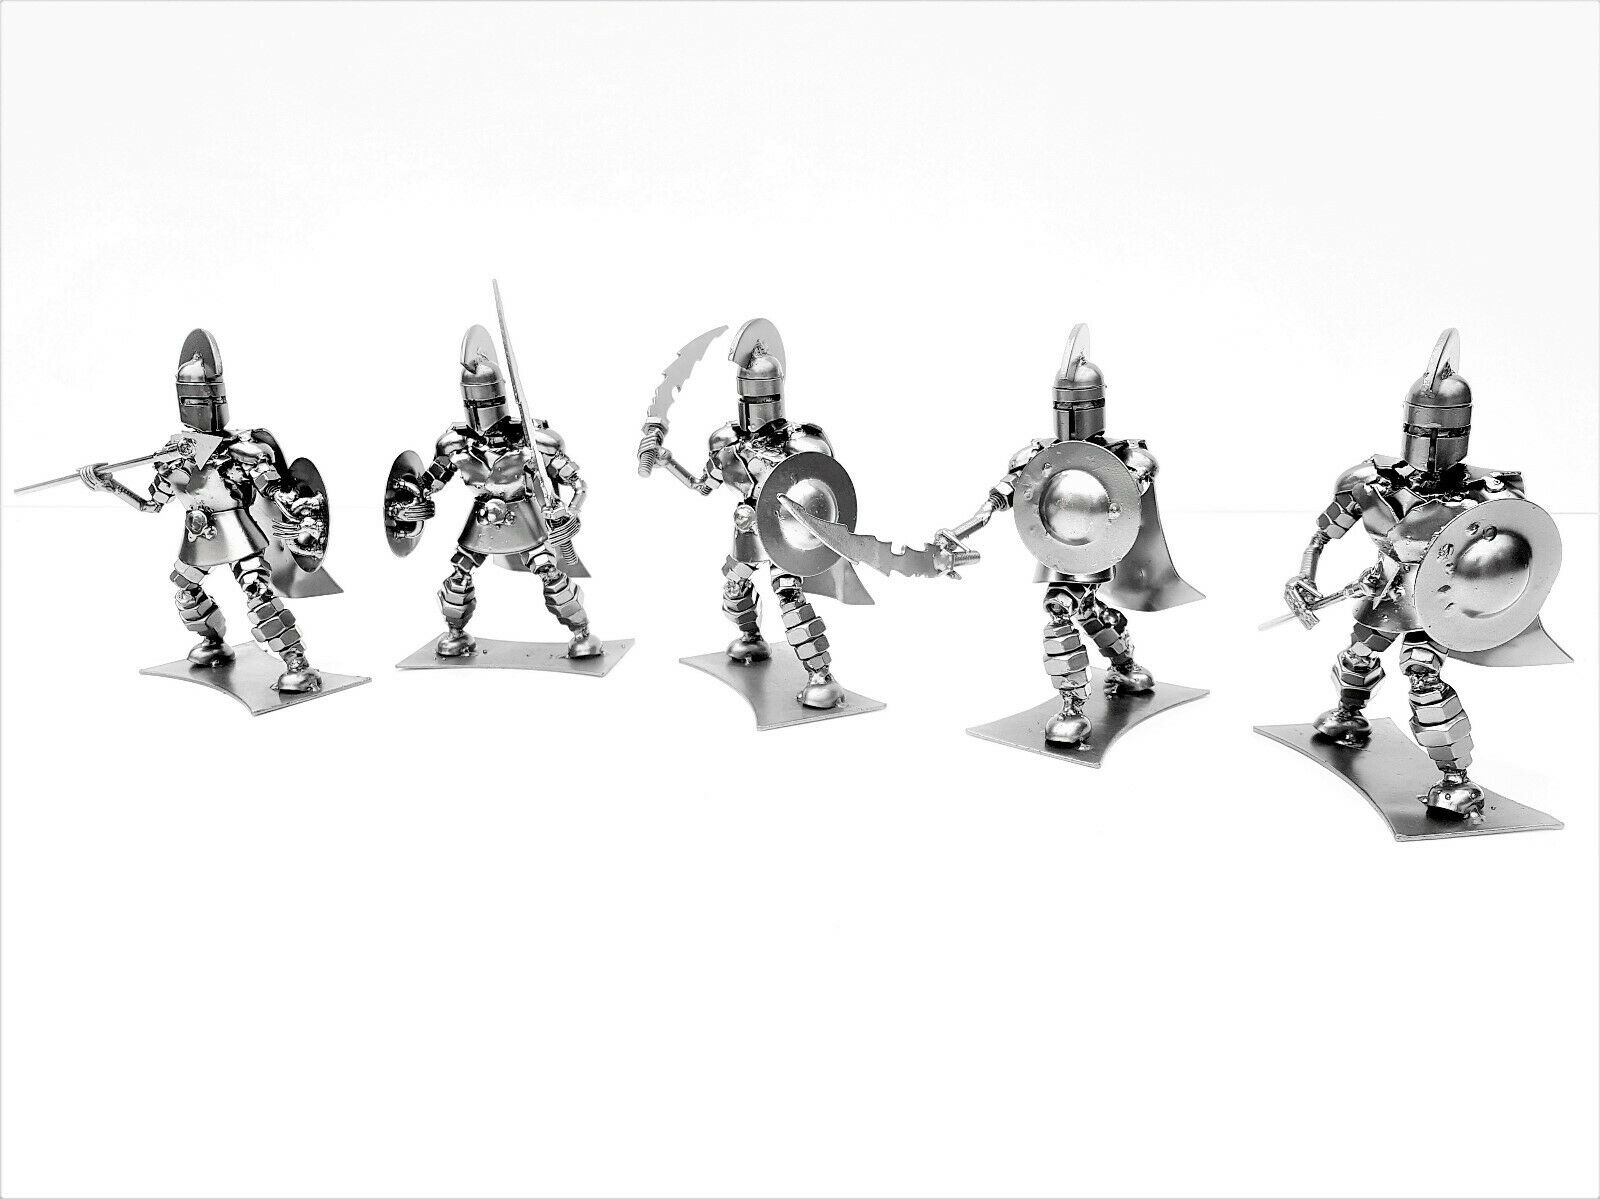 Spartan Warrior Collection 15cm Figure   Model Metal Art Productions Sculpture